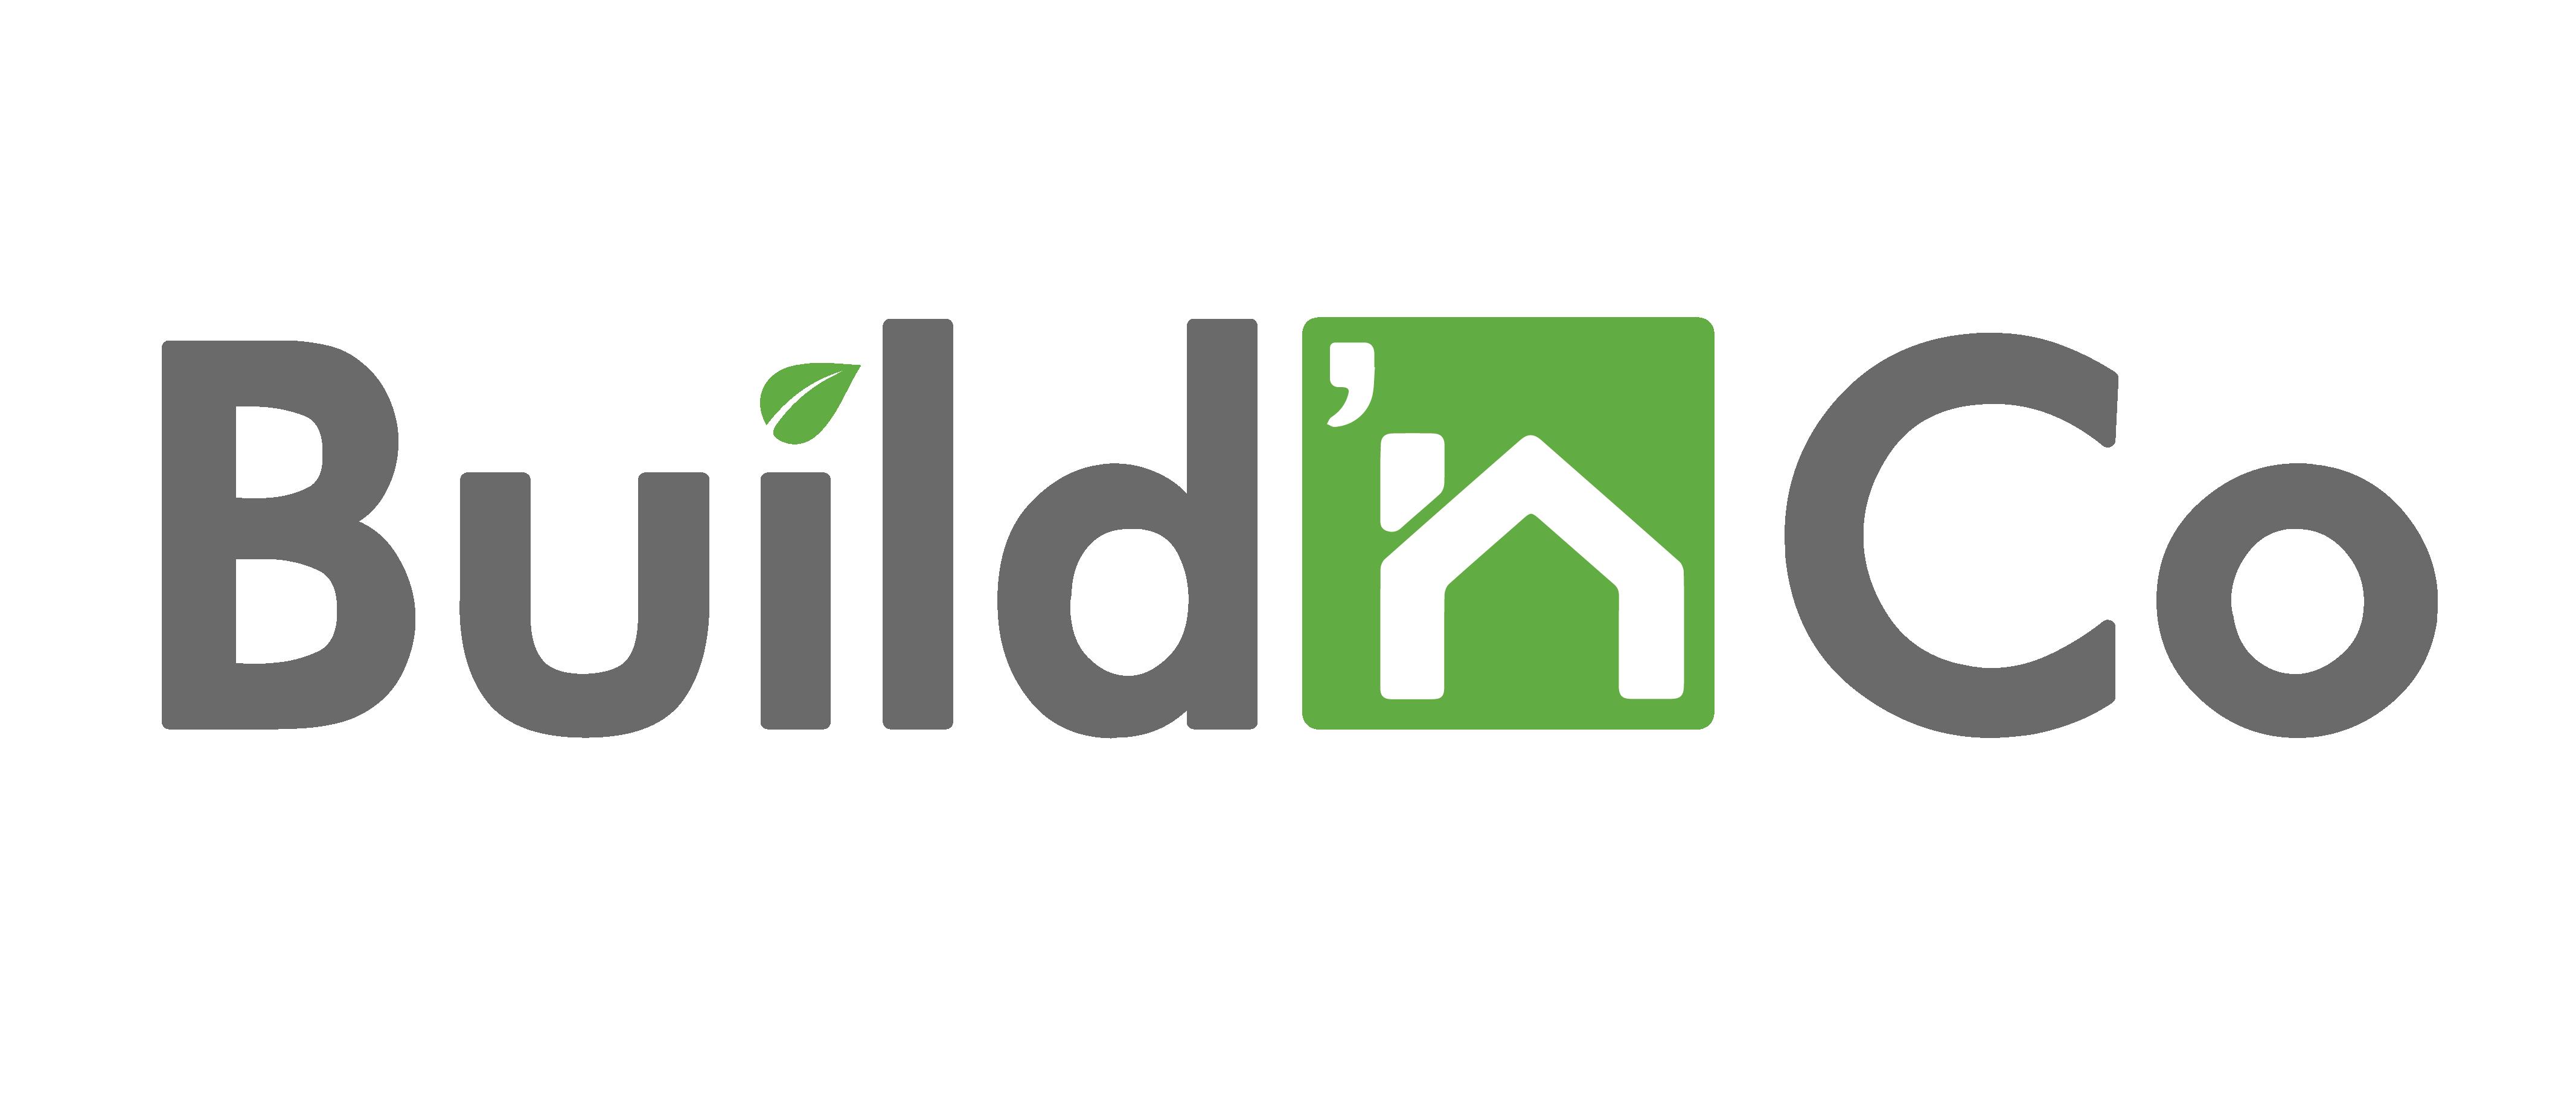 BUILDn Co Transparent